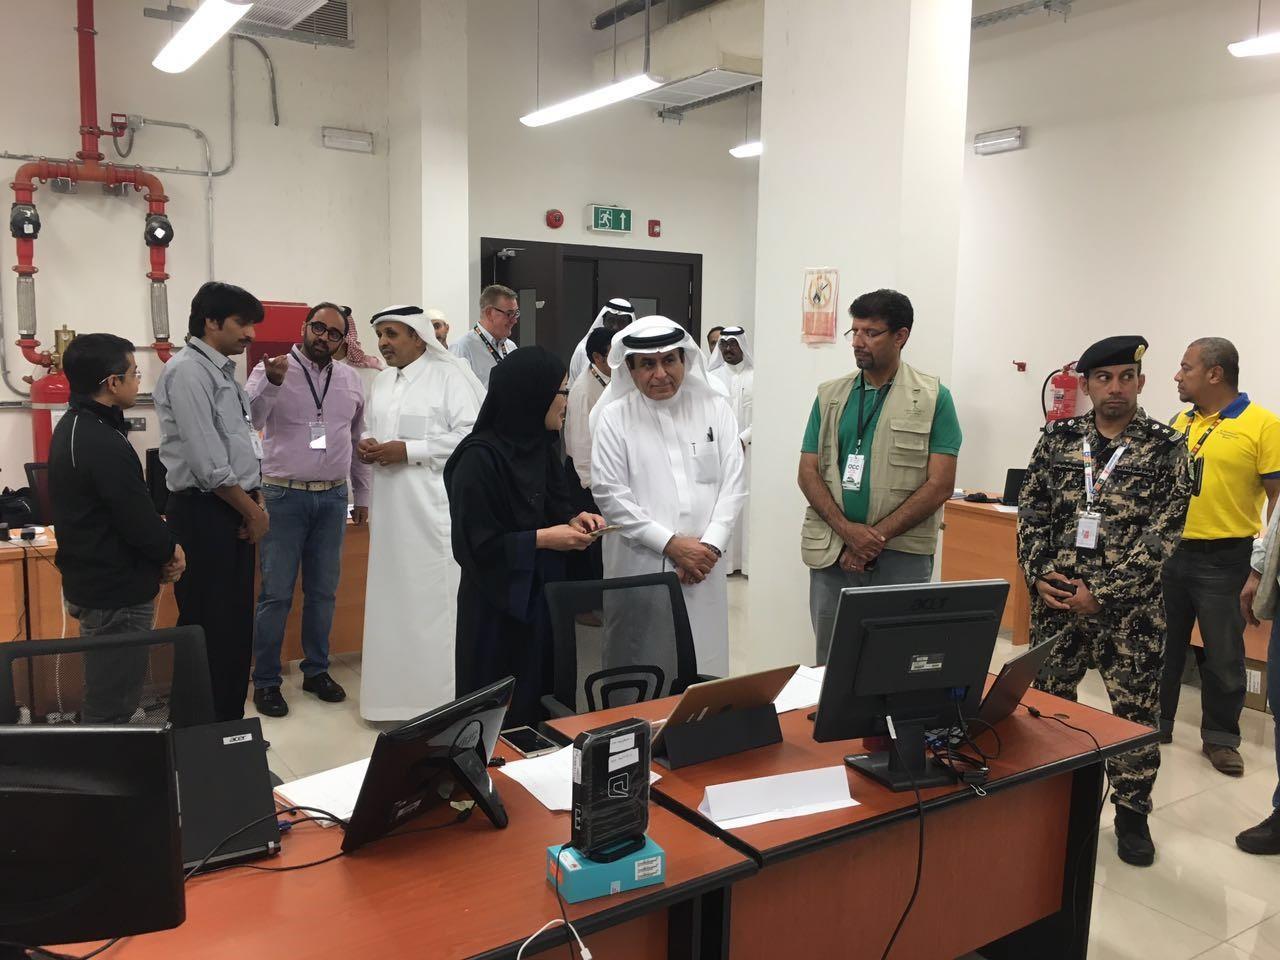 DXC Technology and Makkah Region Development Authority